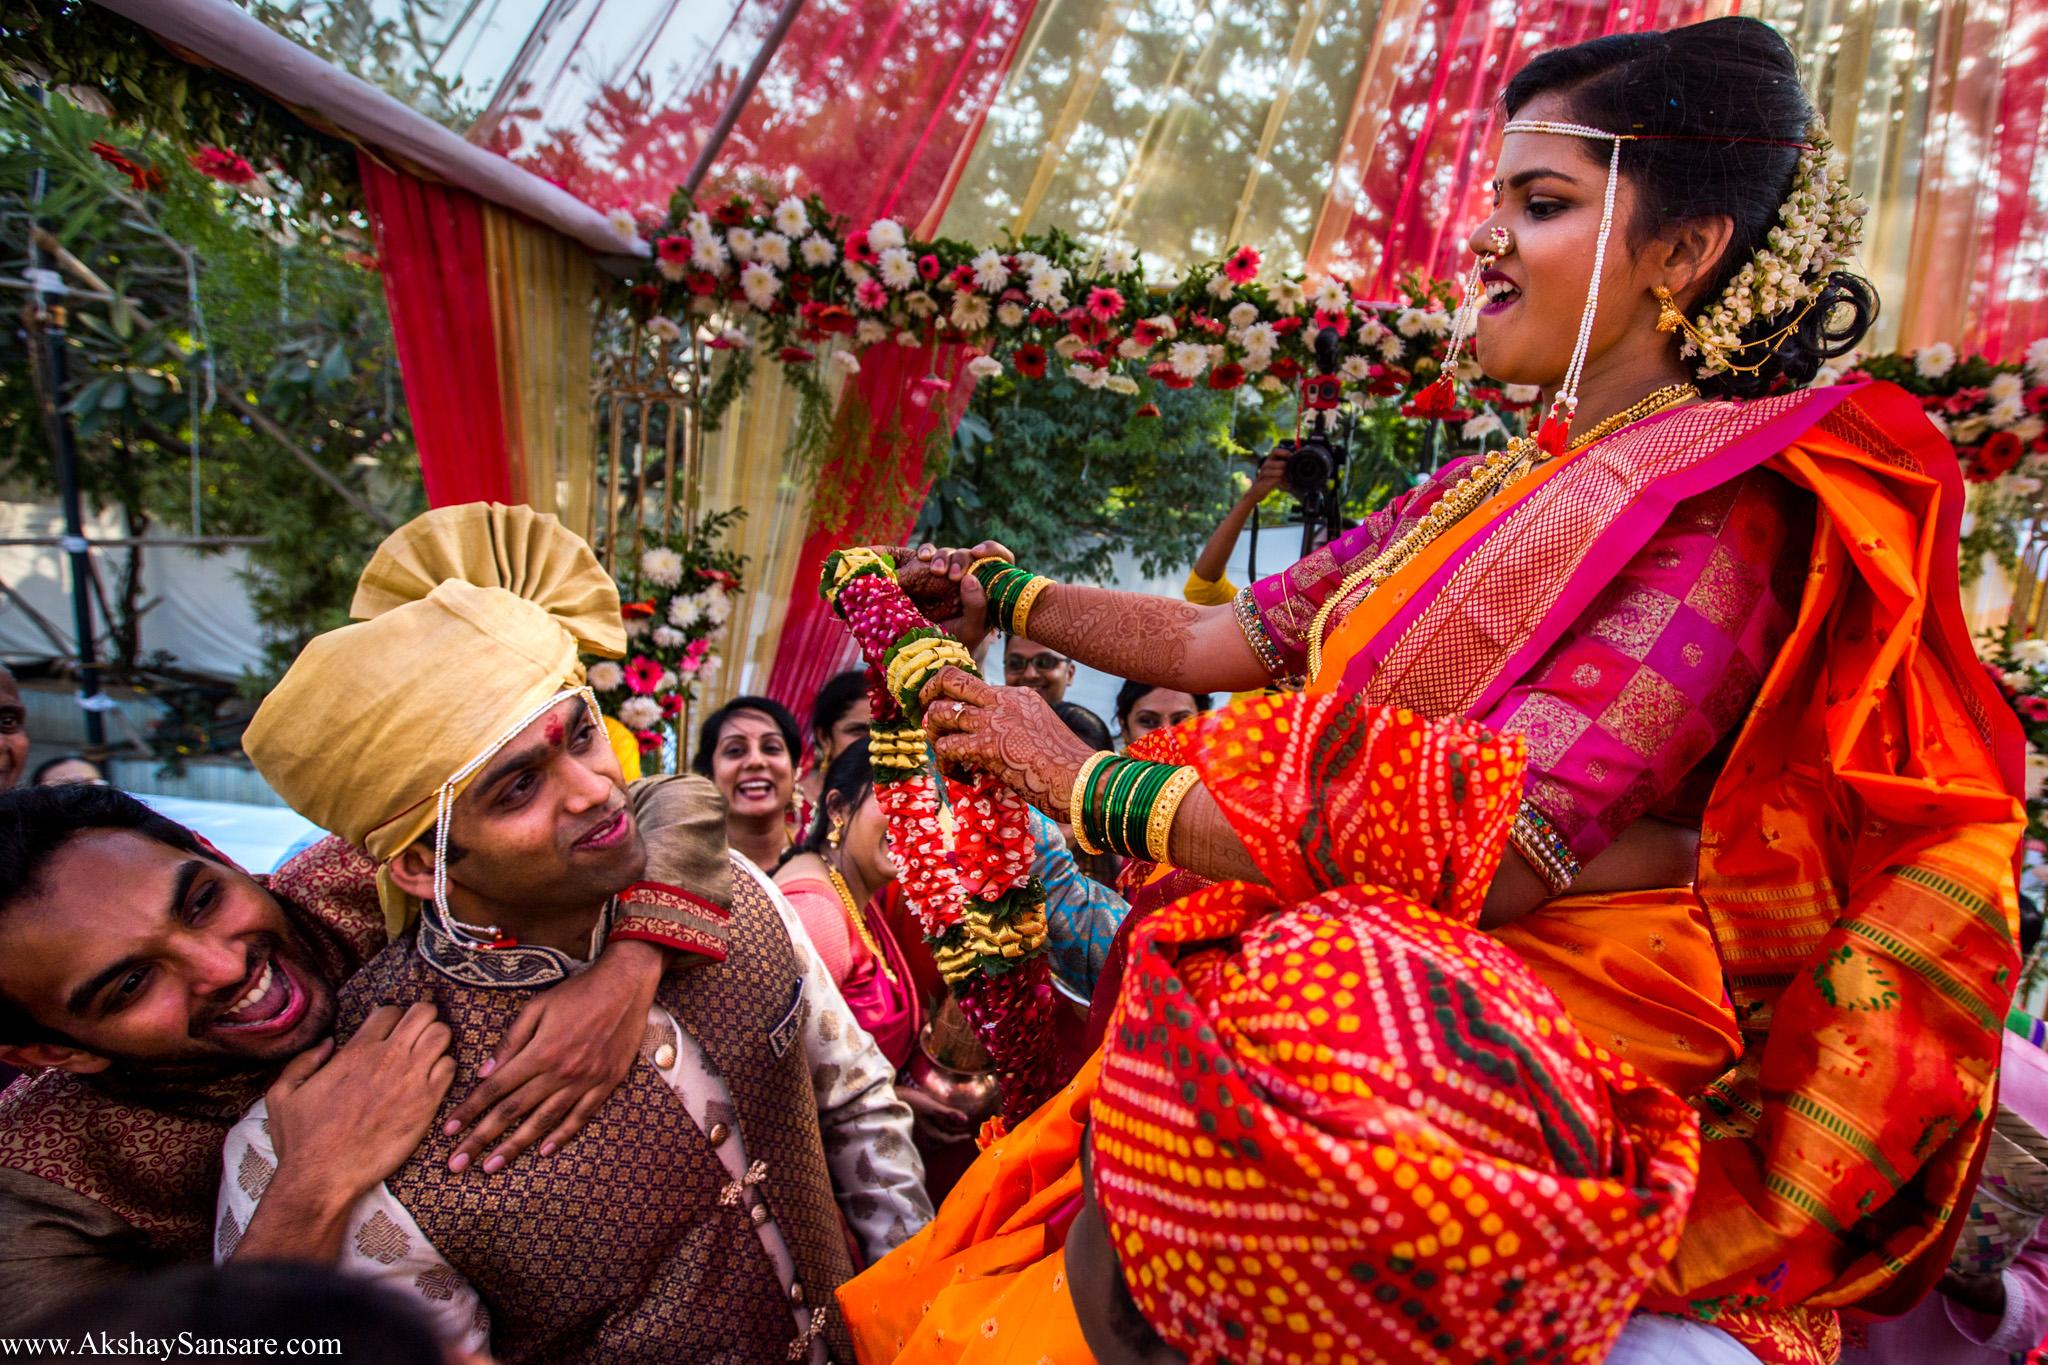 Salil x Kimaya Akshay Sansare Photography Candid wedding Photographer in mumbai best(33).jpg